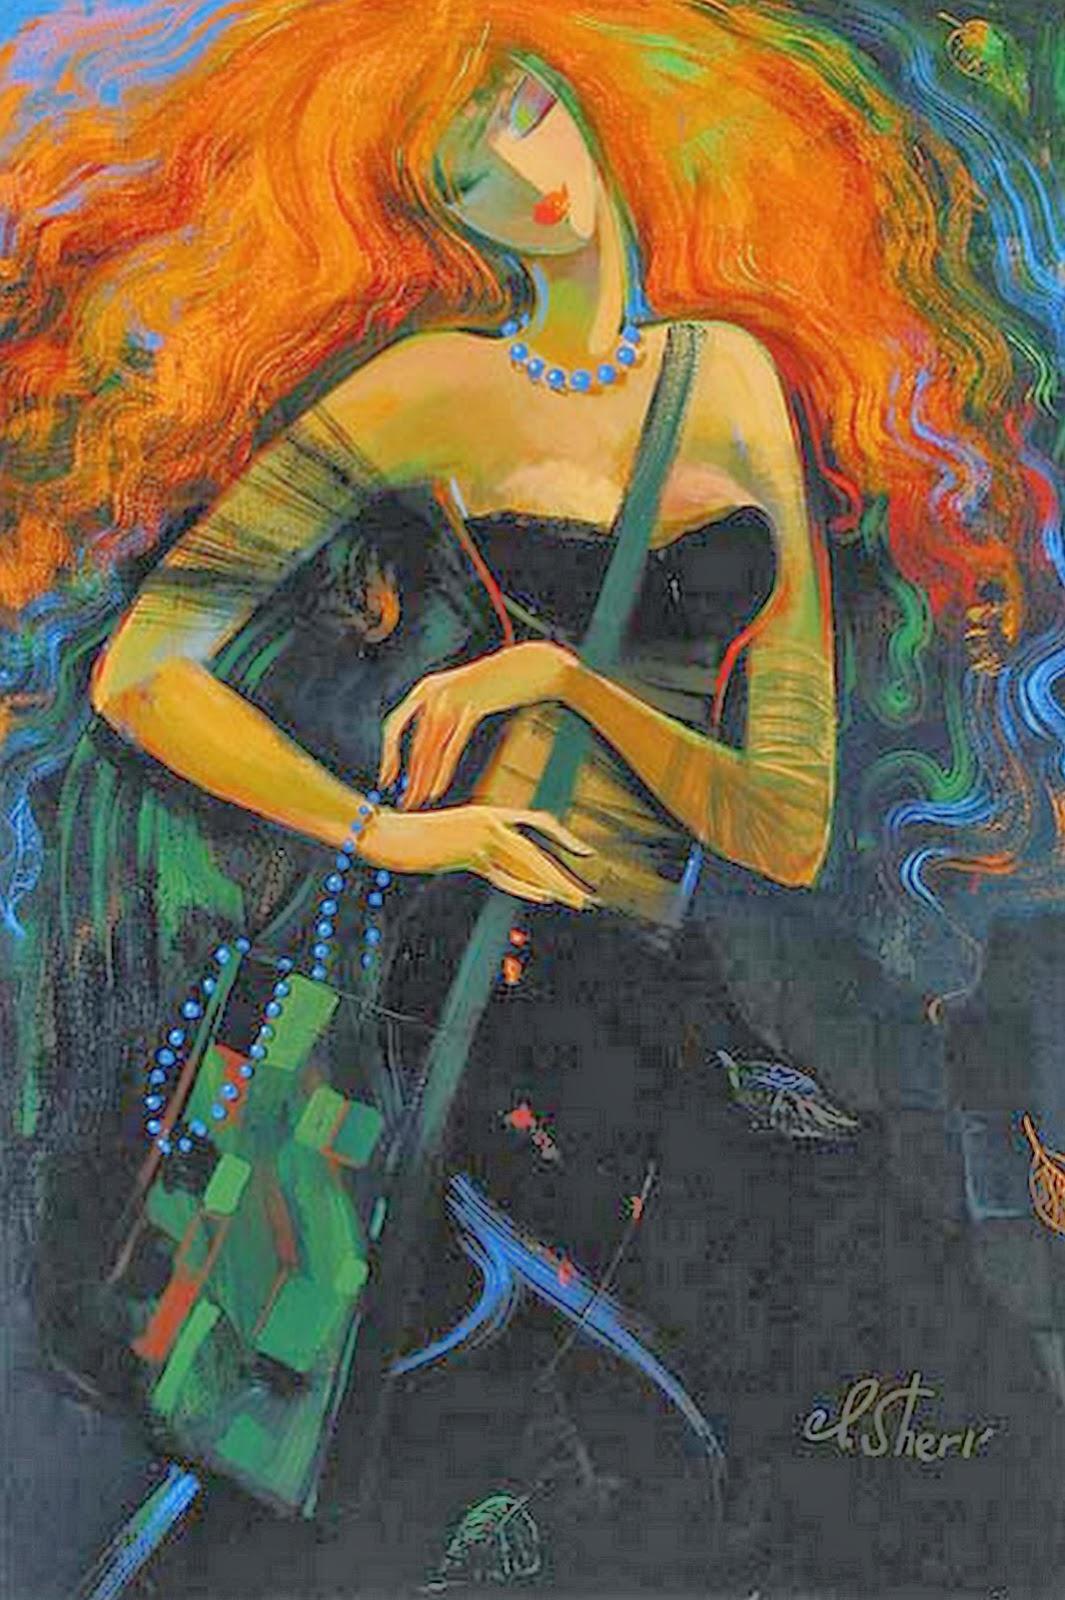 Resultado de imagen para Pintora Irene Sheri